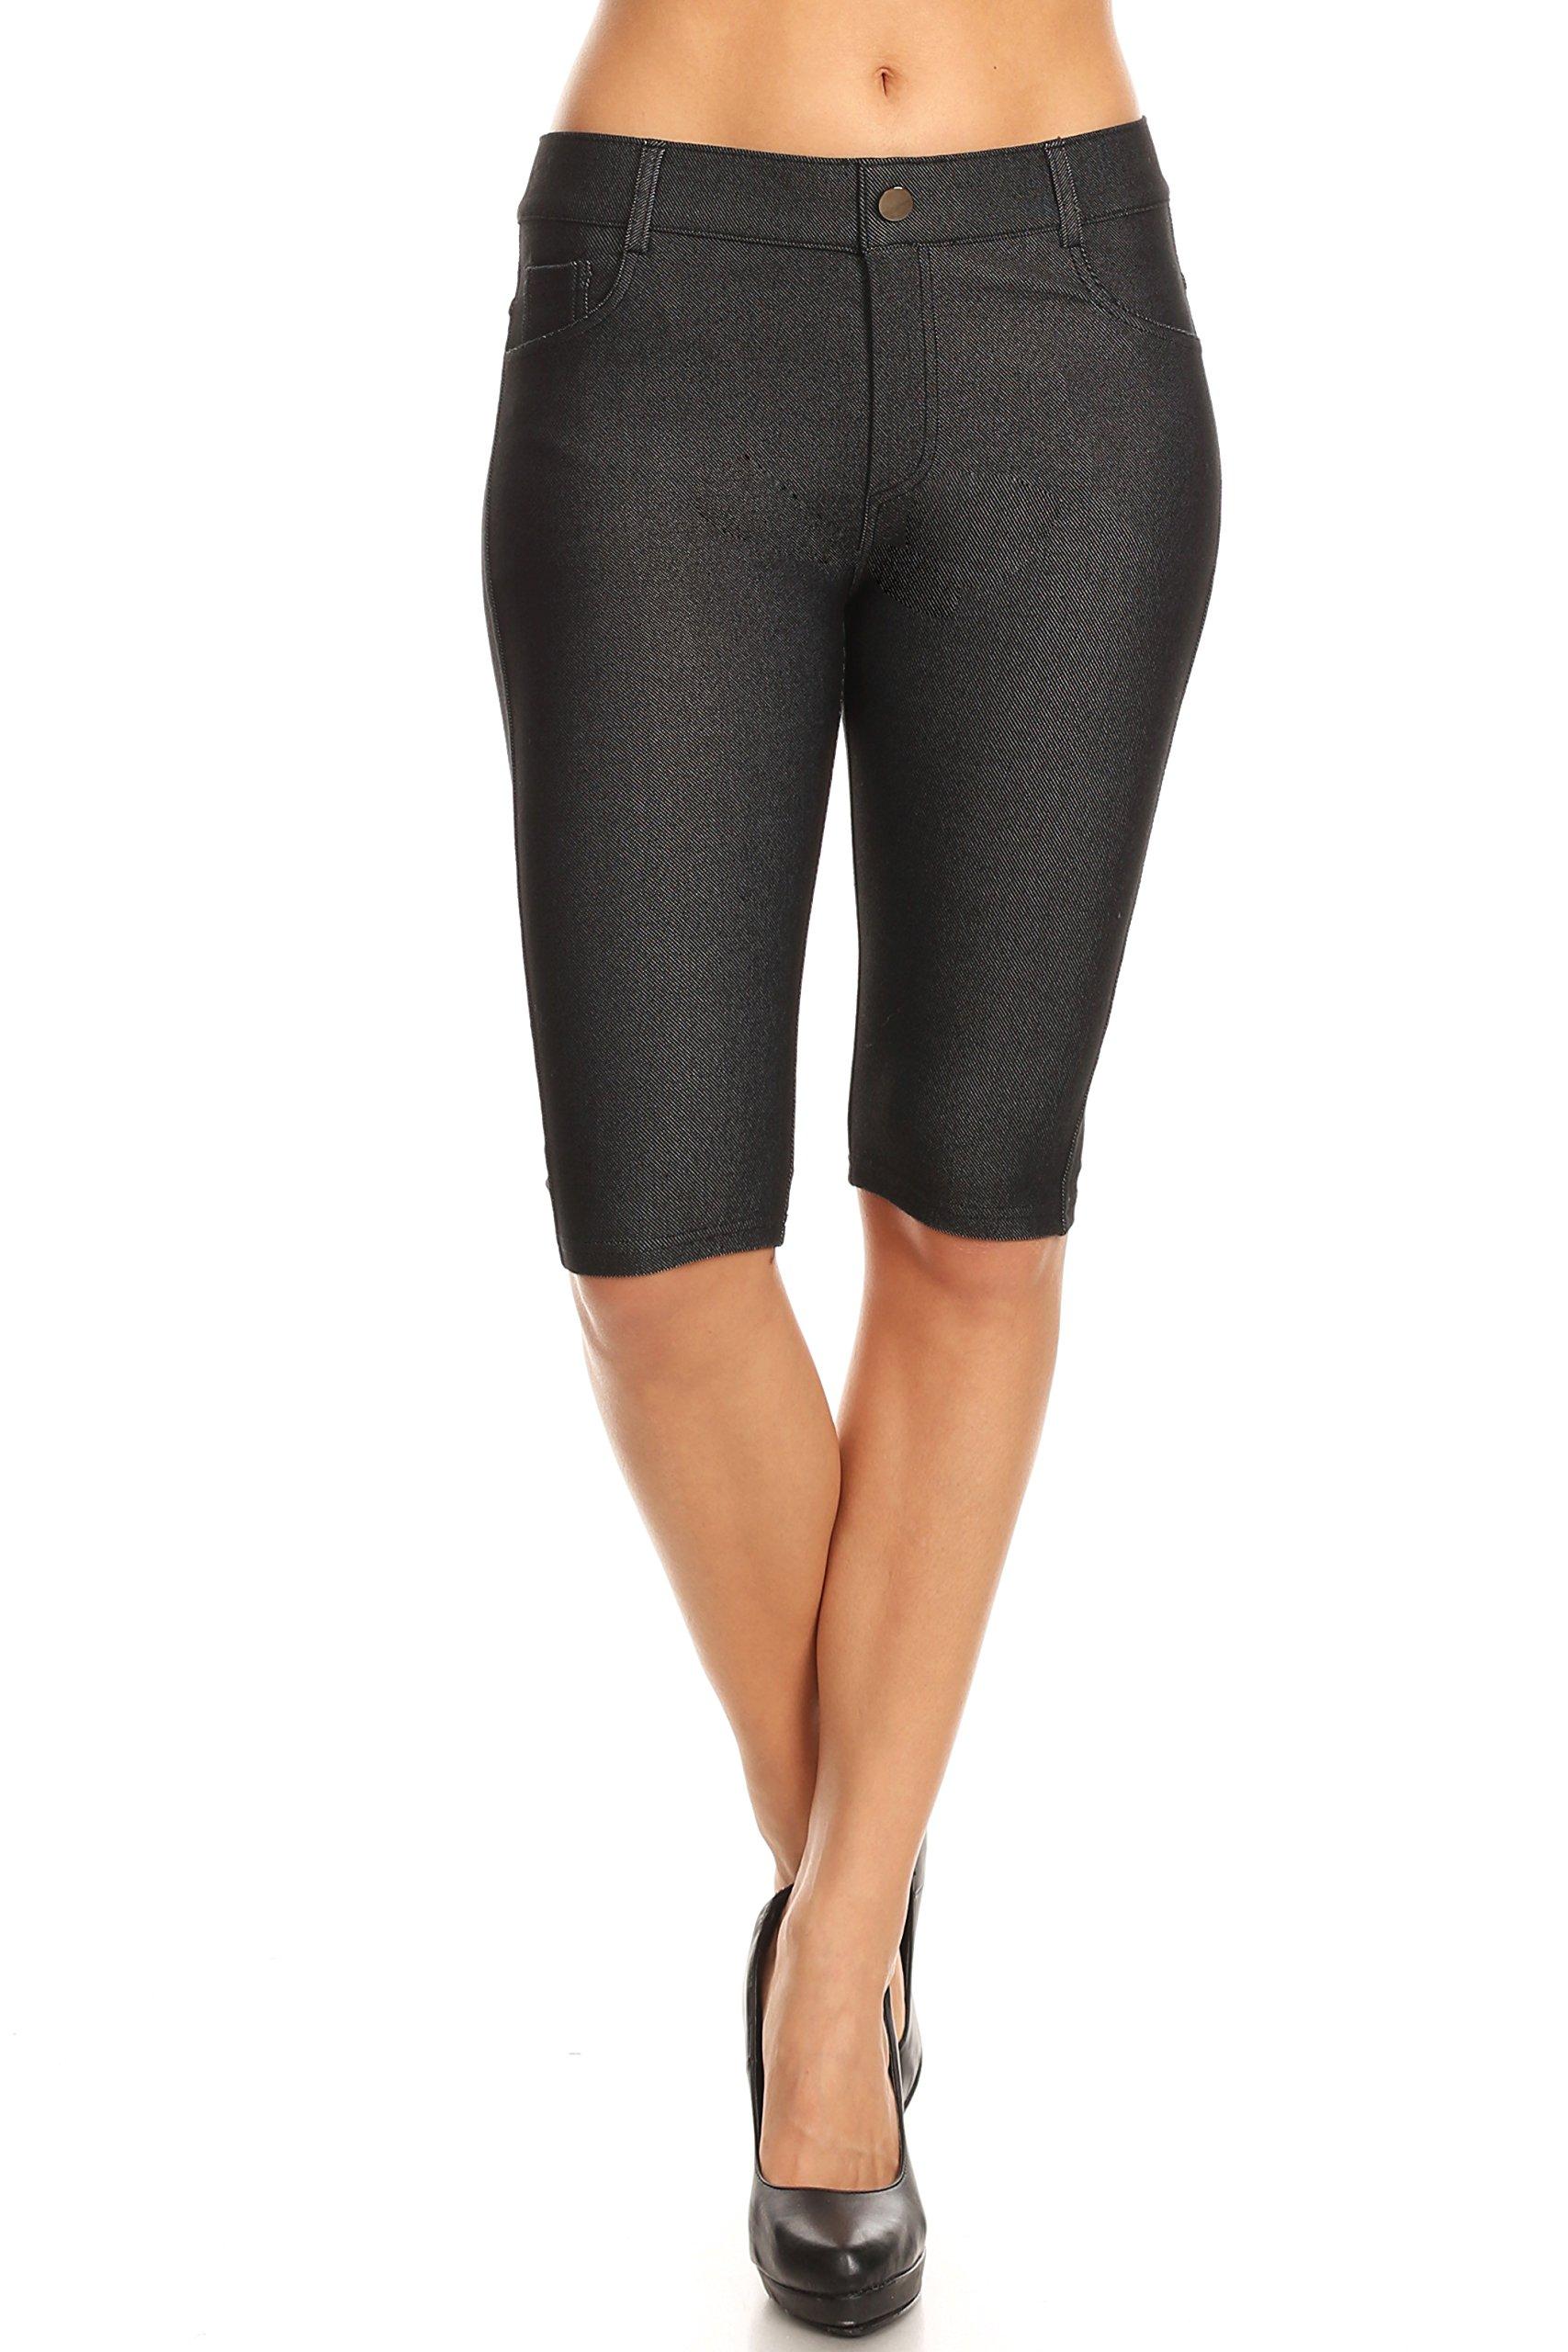 ICONOFLASH Women's Solid Colored Denim Style Bermuda Shorts (Black, Small)